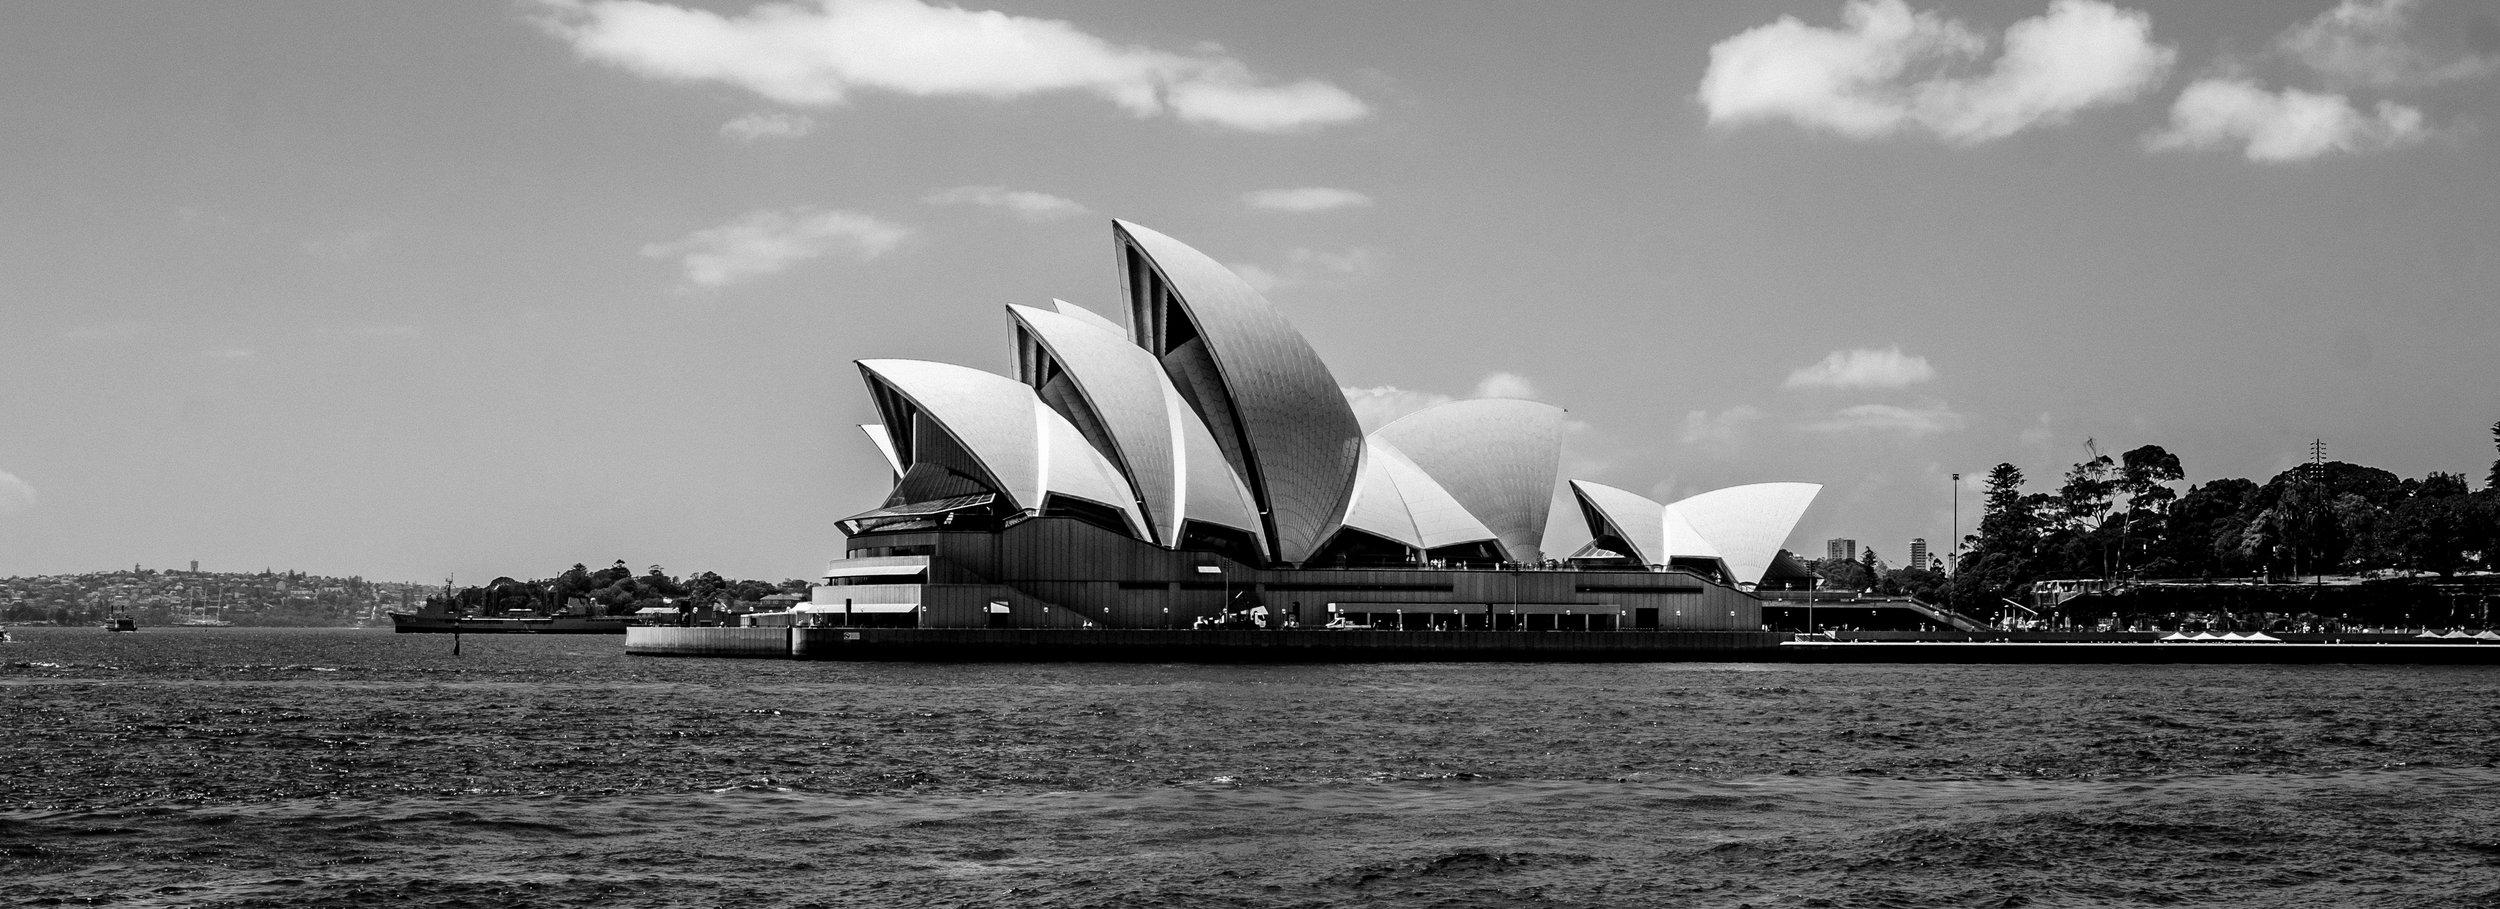 Sydney Opera House, Designed by Jørn Utzon.